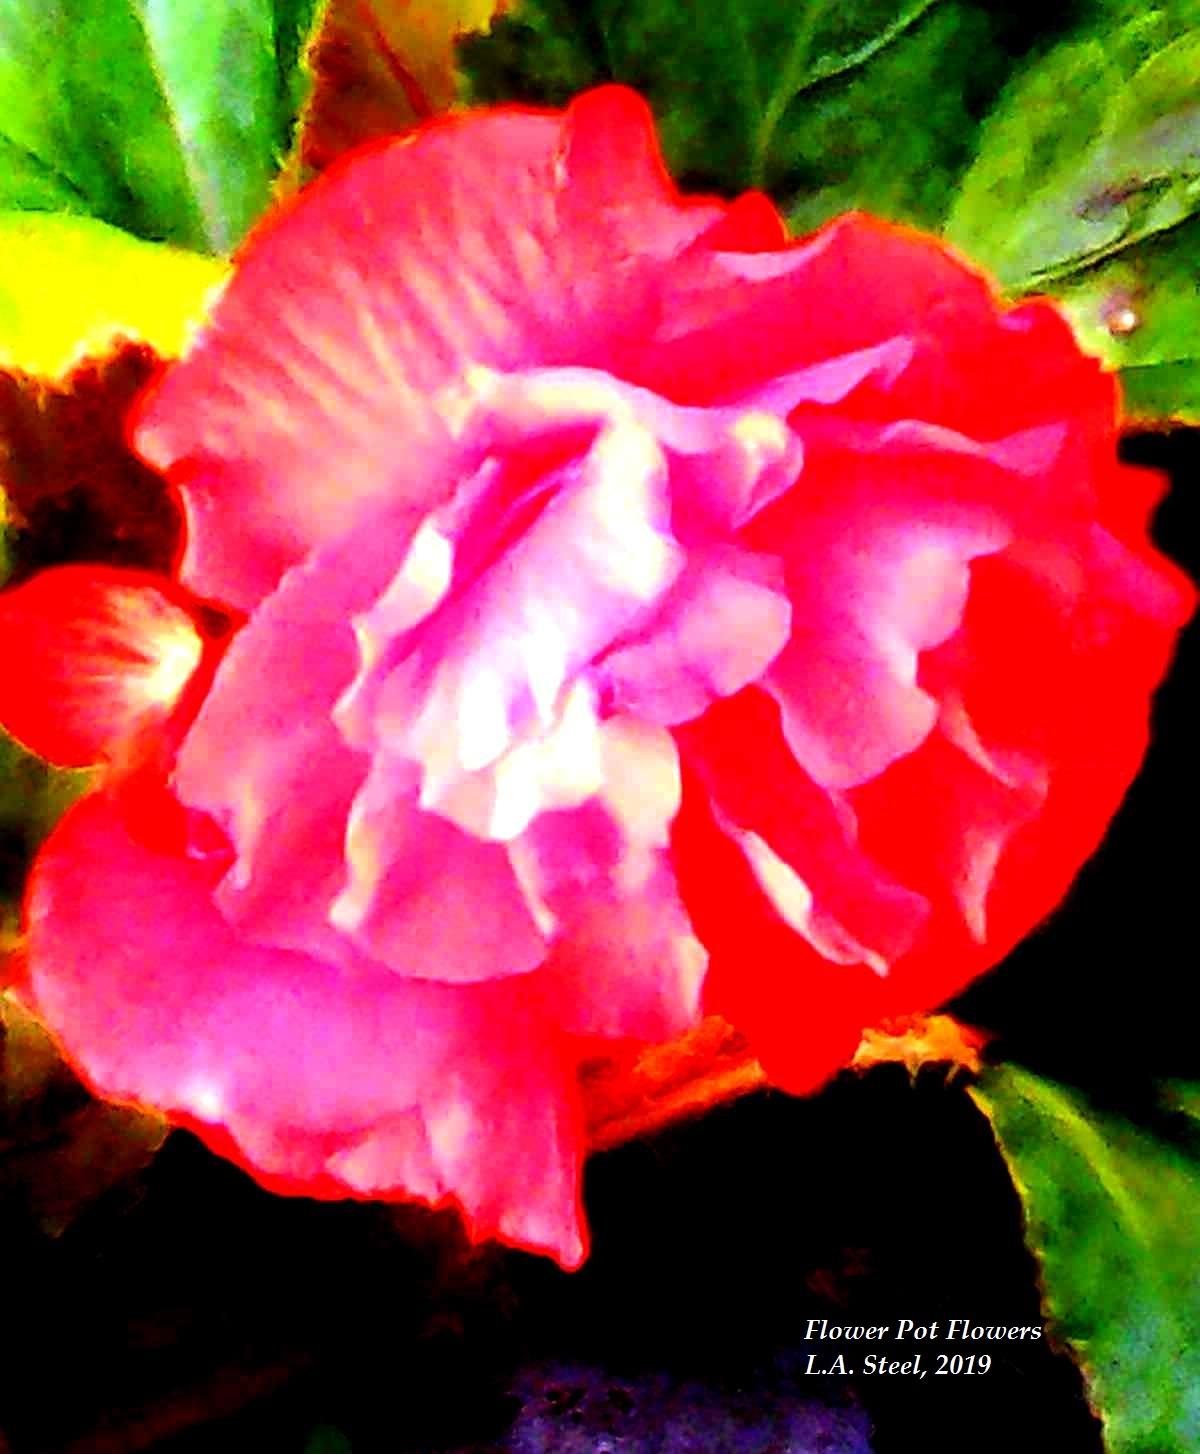 flower pot flowers 2 2019